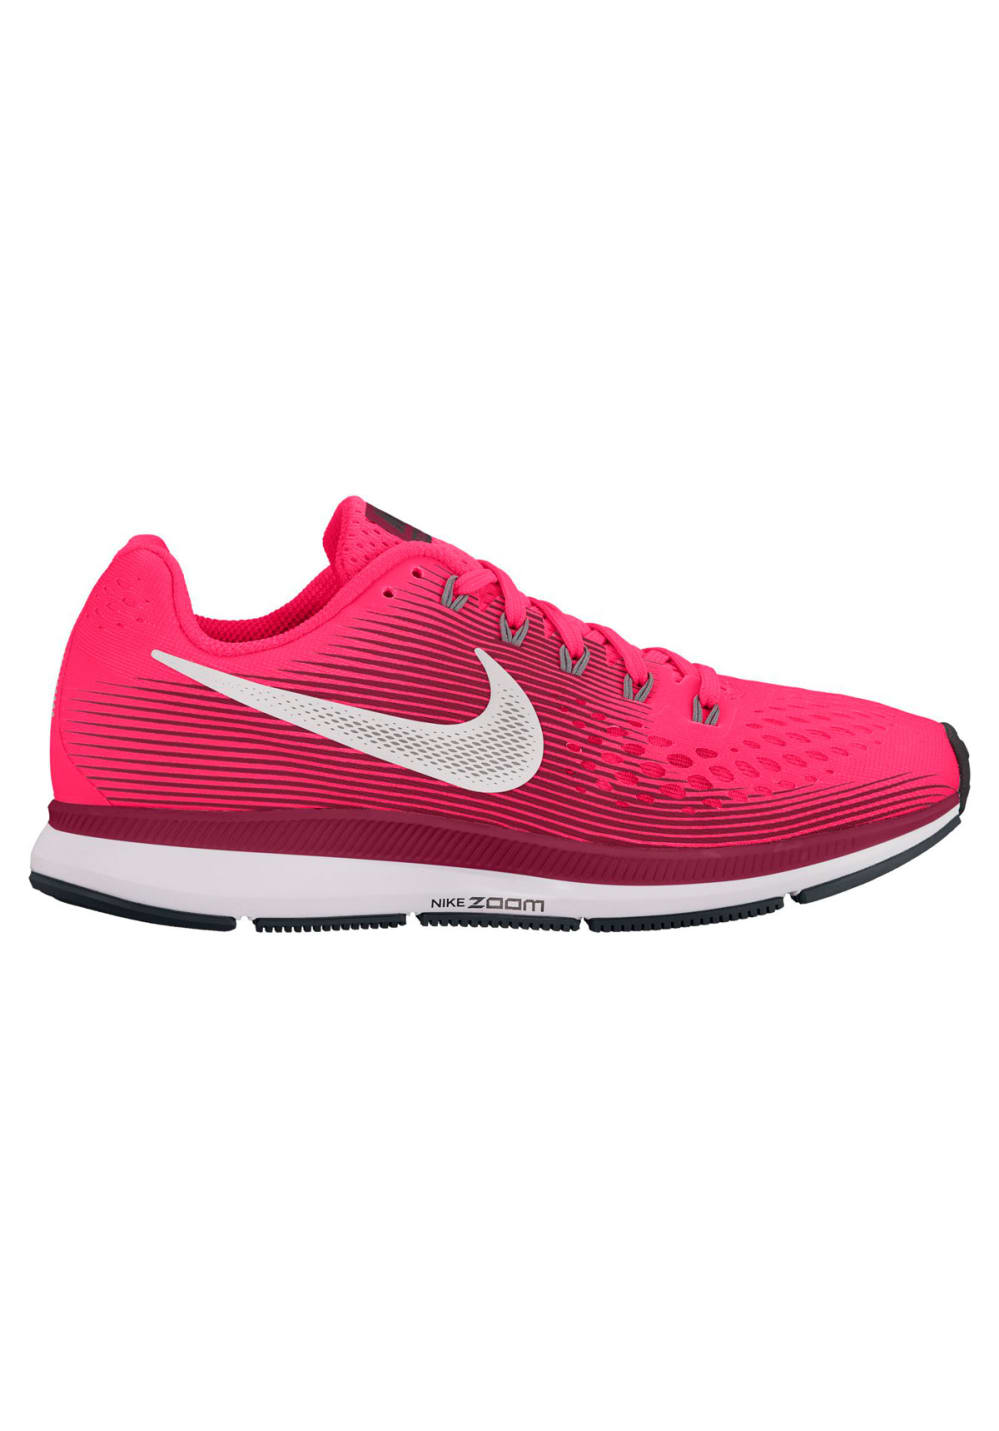 Nike Air Zoom Pegasus 34 - Laufschuhe für Damen - Pink